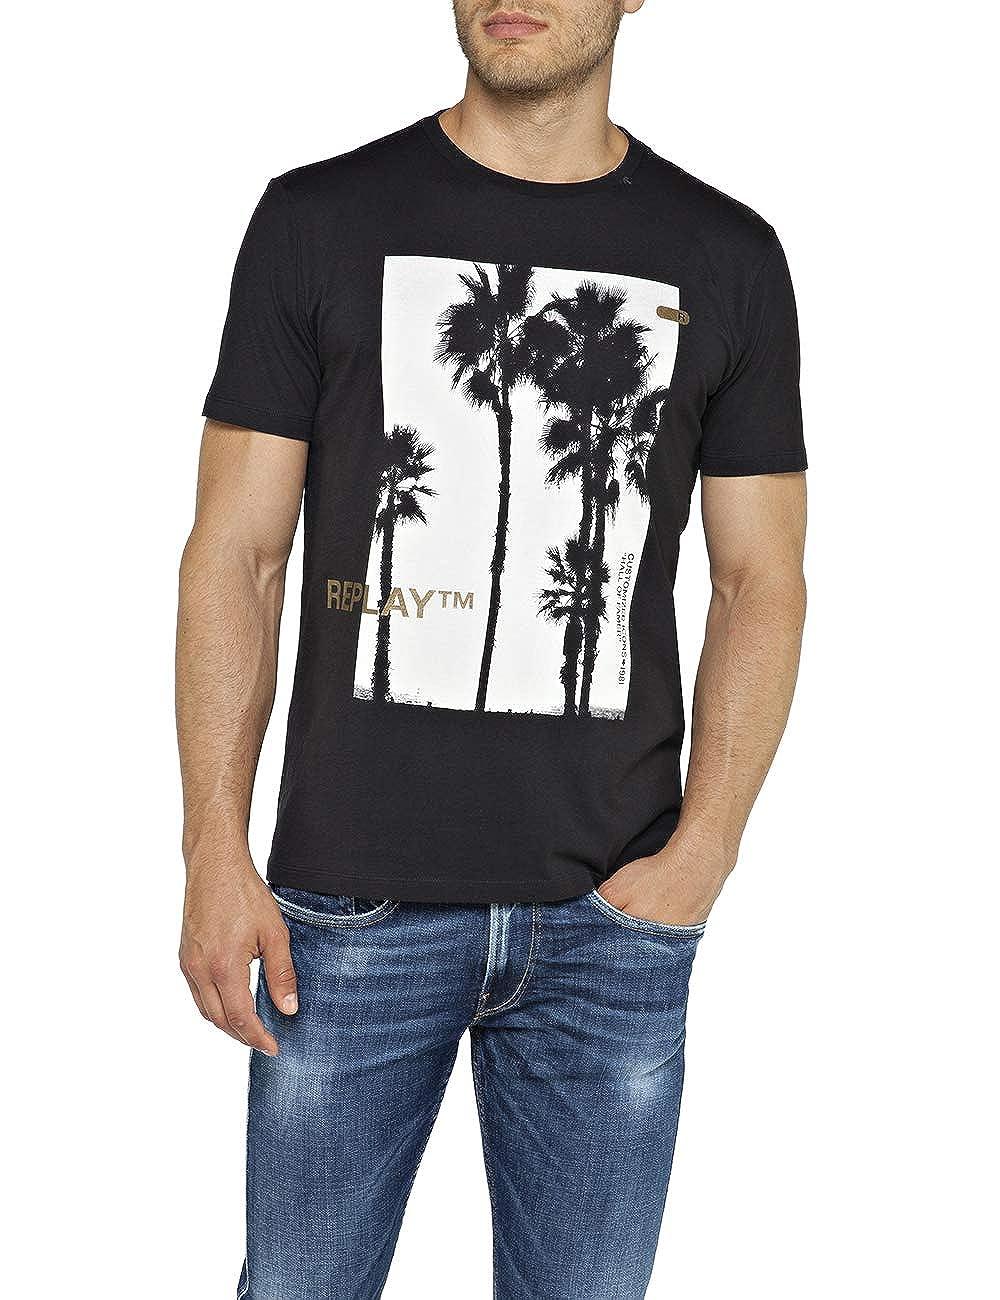 Black Replay Tropical Logo Crew-Neck Mens T-Shirt